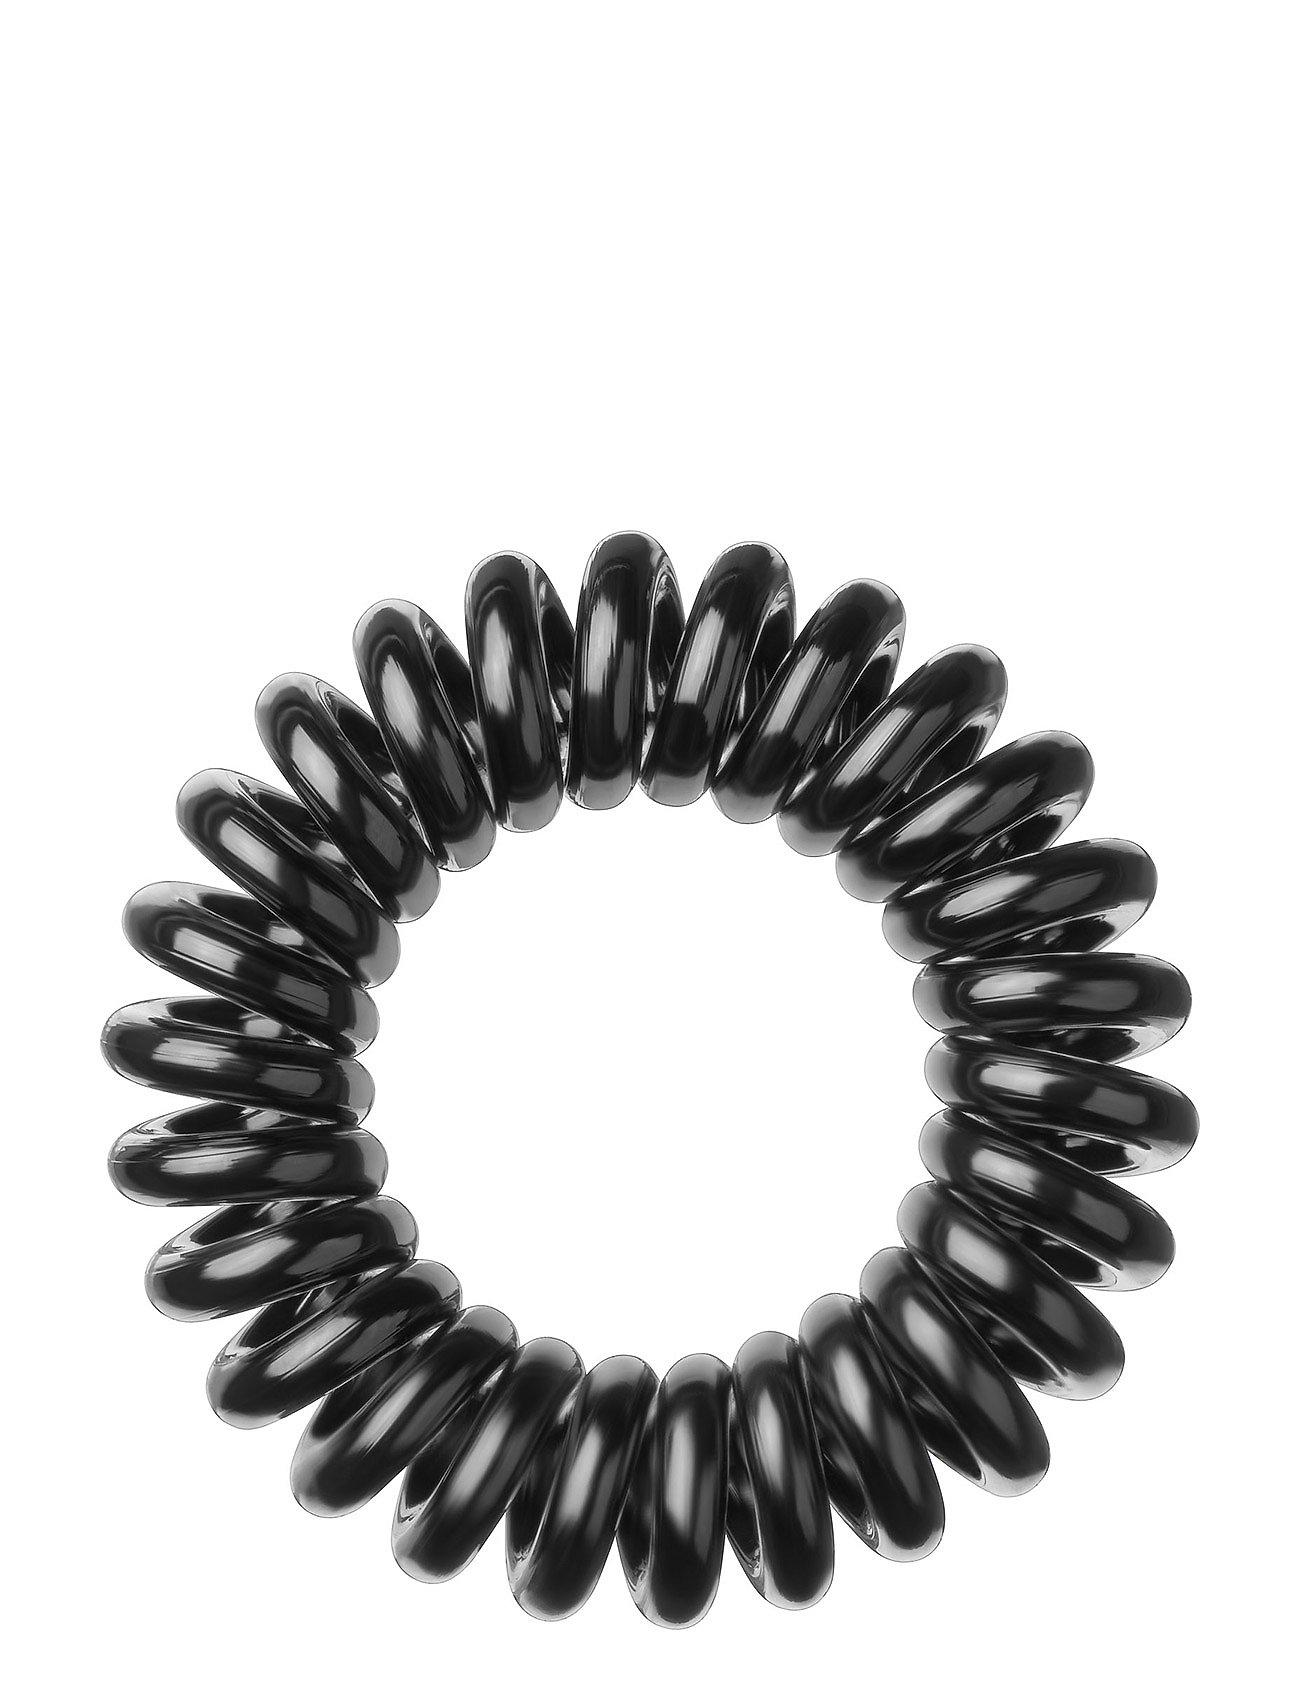 Image of Invisibobble Power True Black Accessories Hair Accessories Hair Accessories Sort Invisibobble (3504033275)